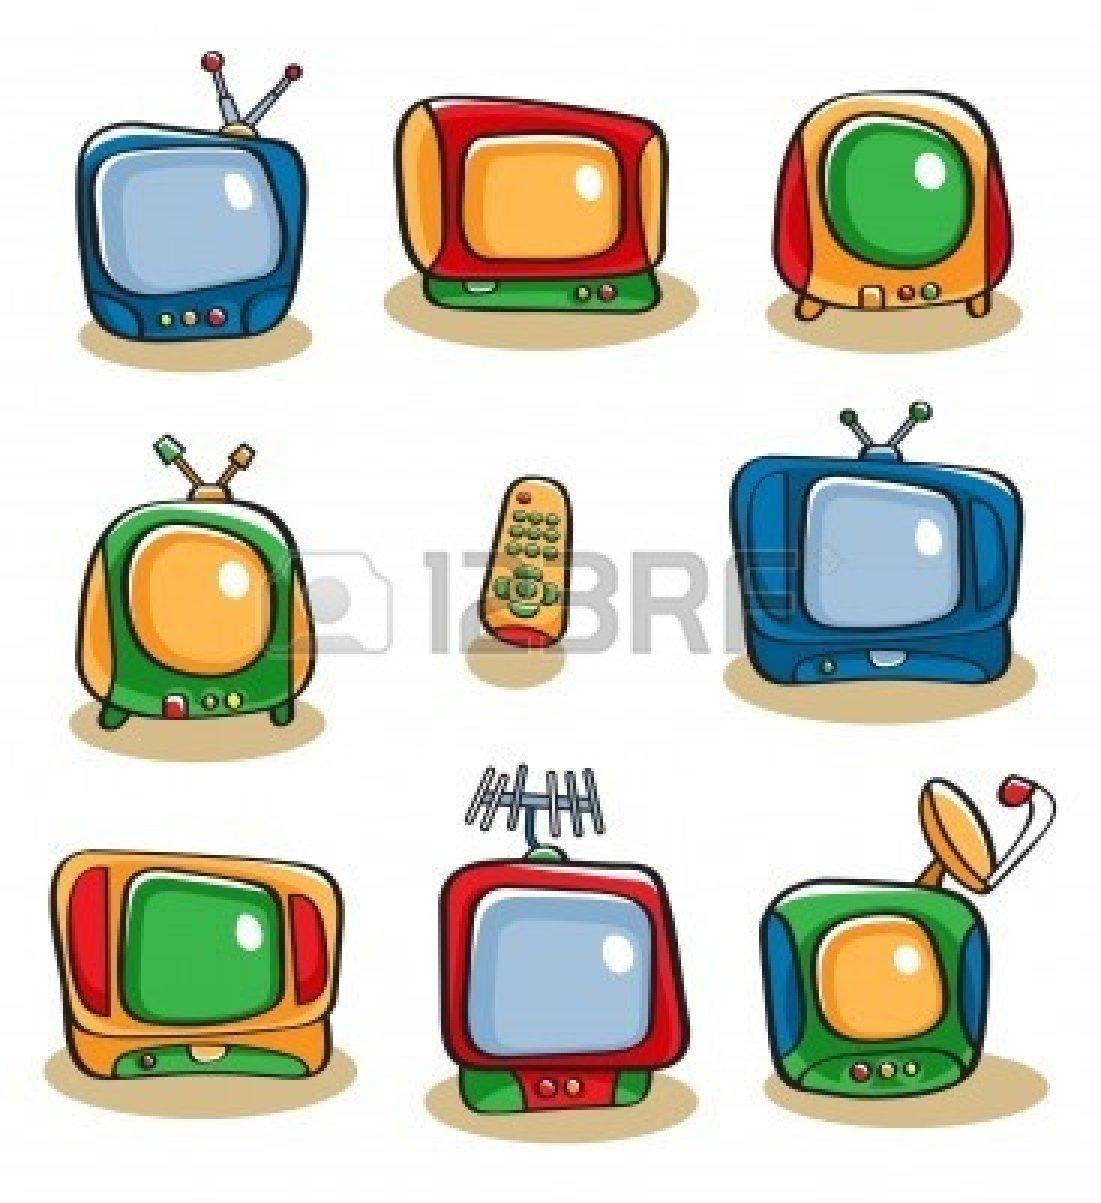 1101x1203 Tv Remote Cartoon Clipart Panda